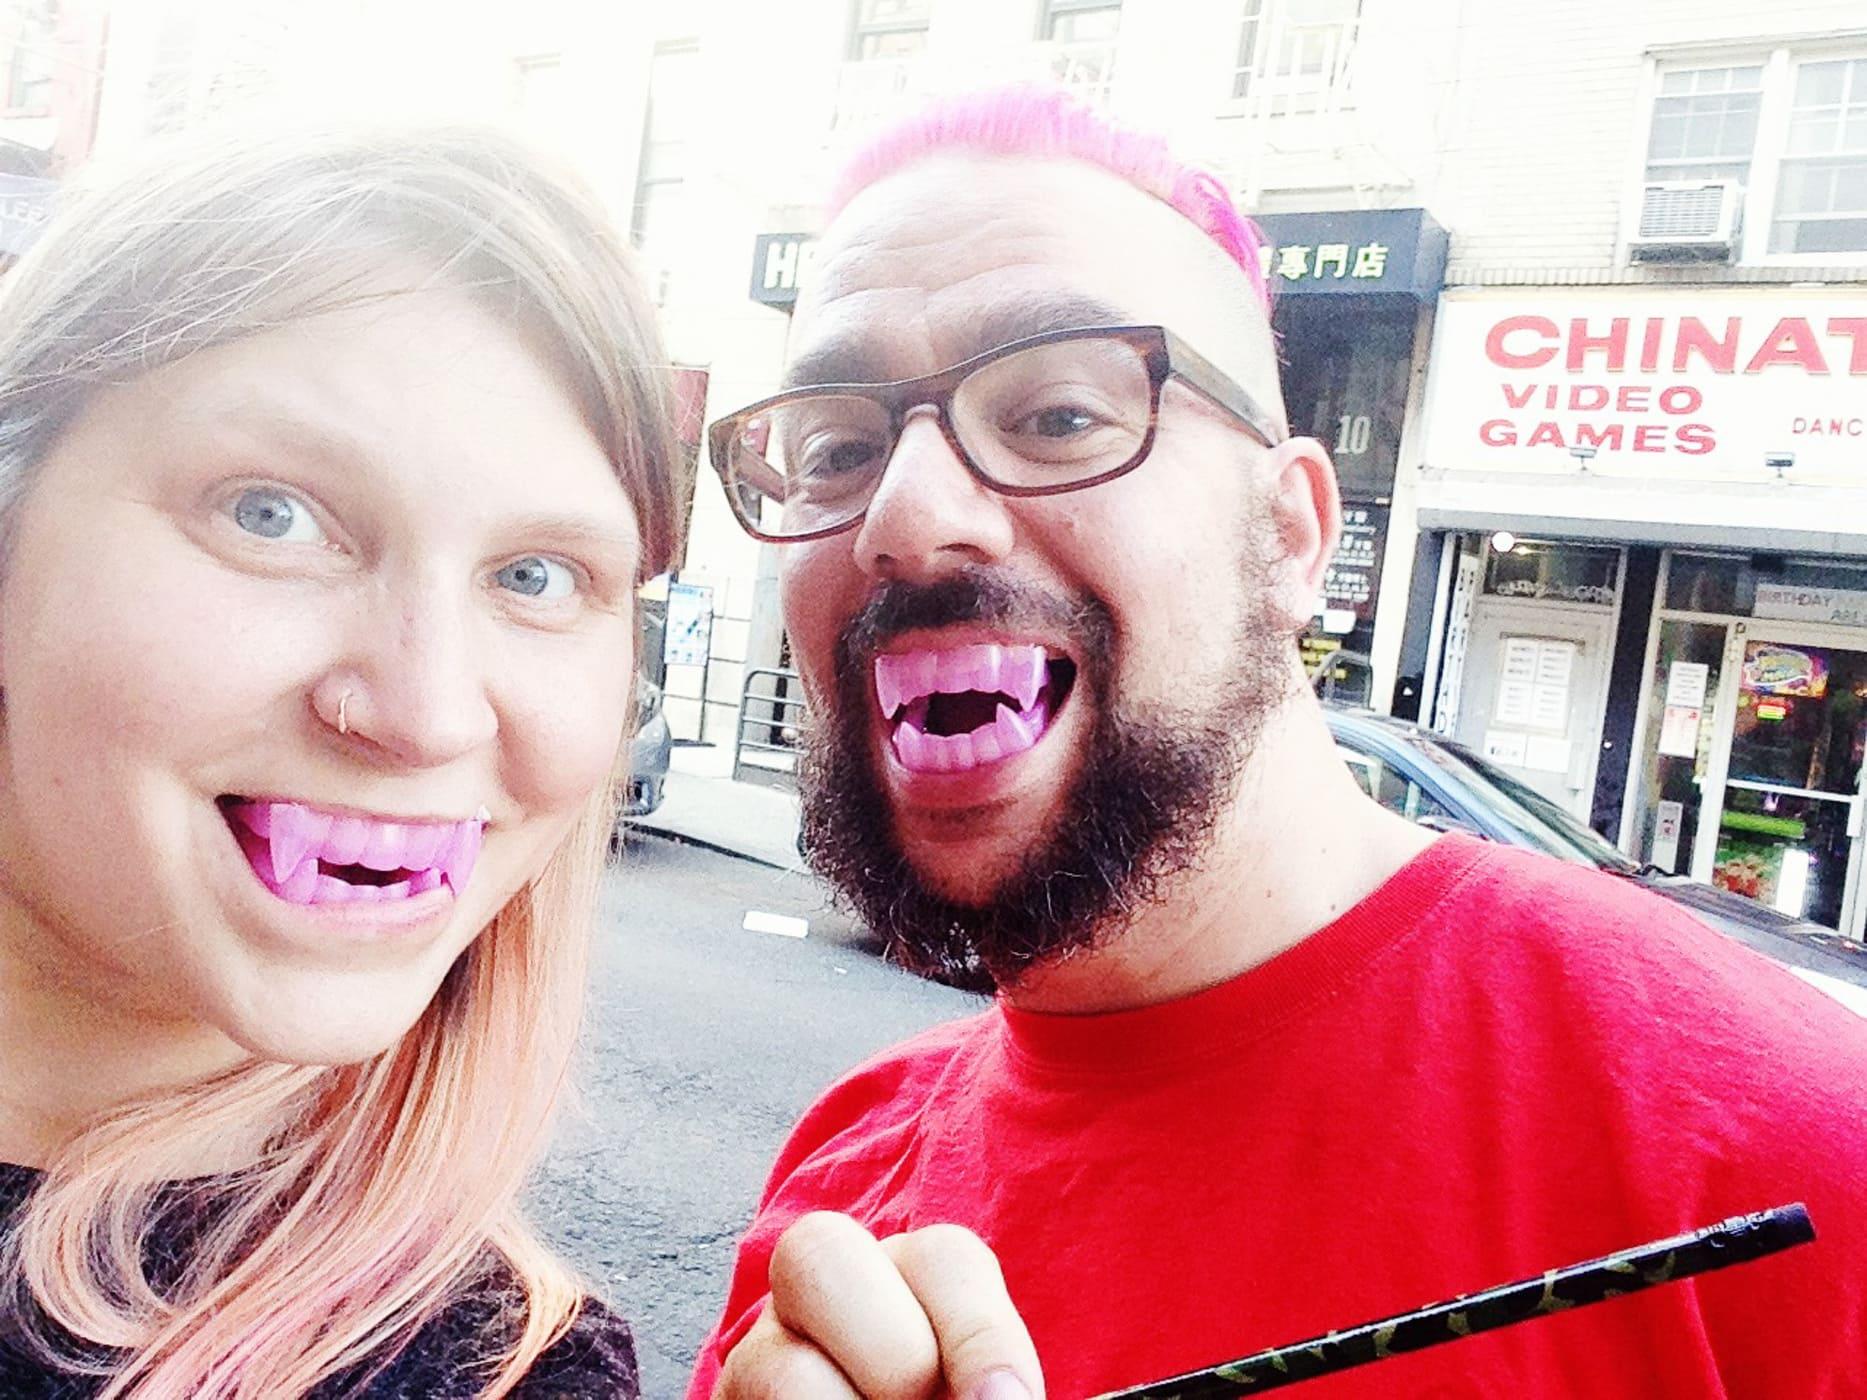 Vampire teeth prize at Chinatown Arcade